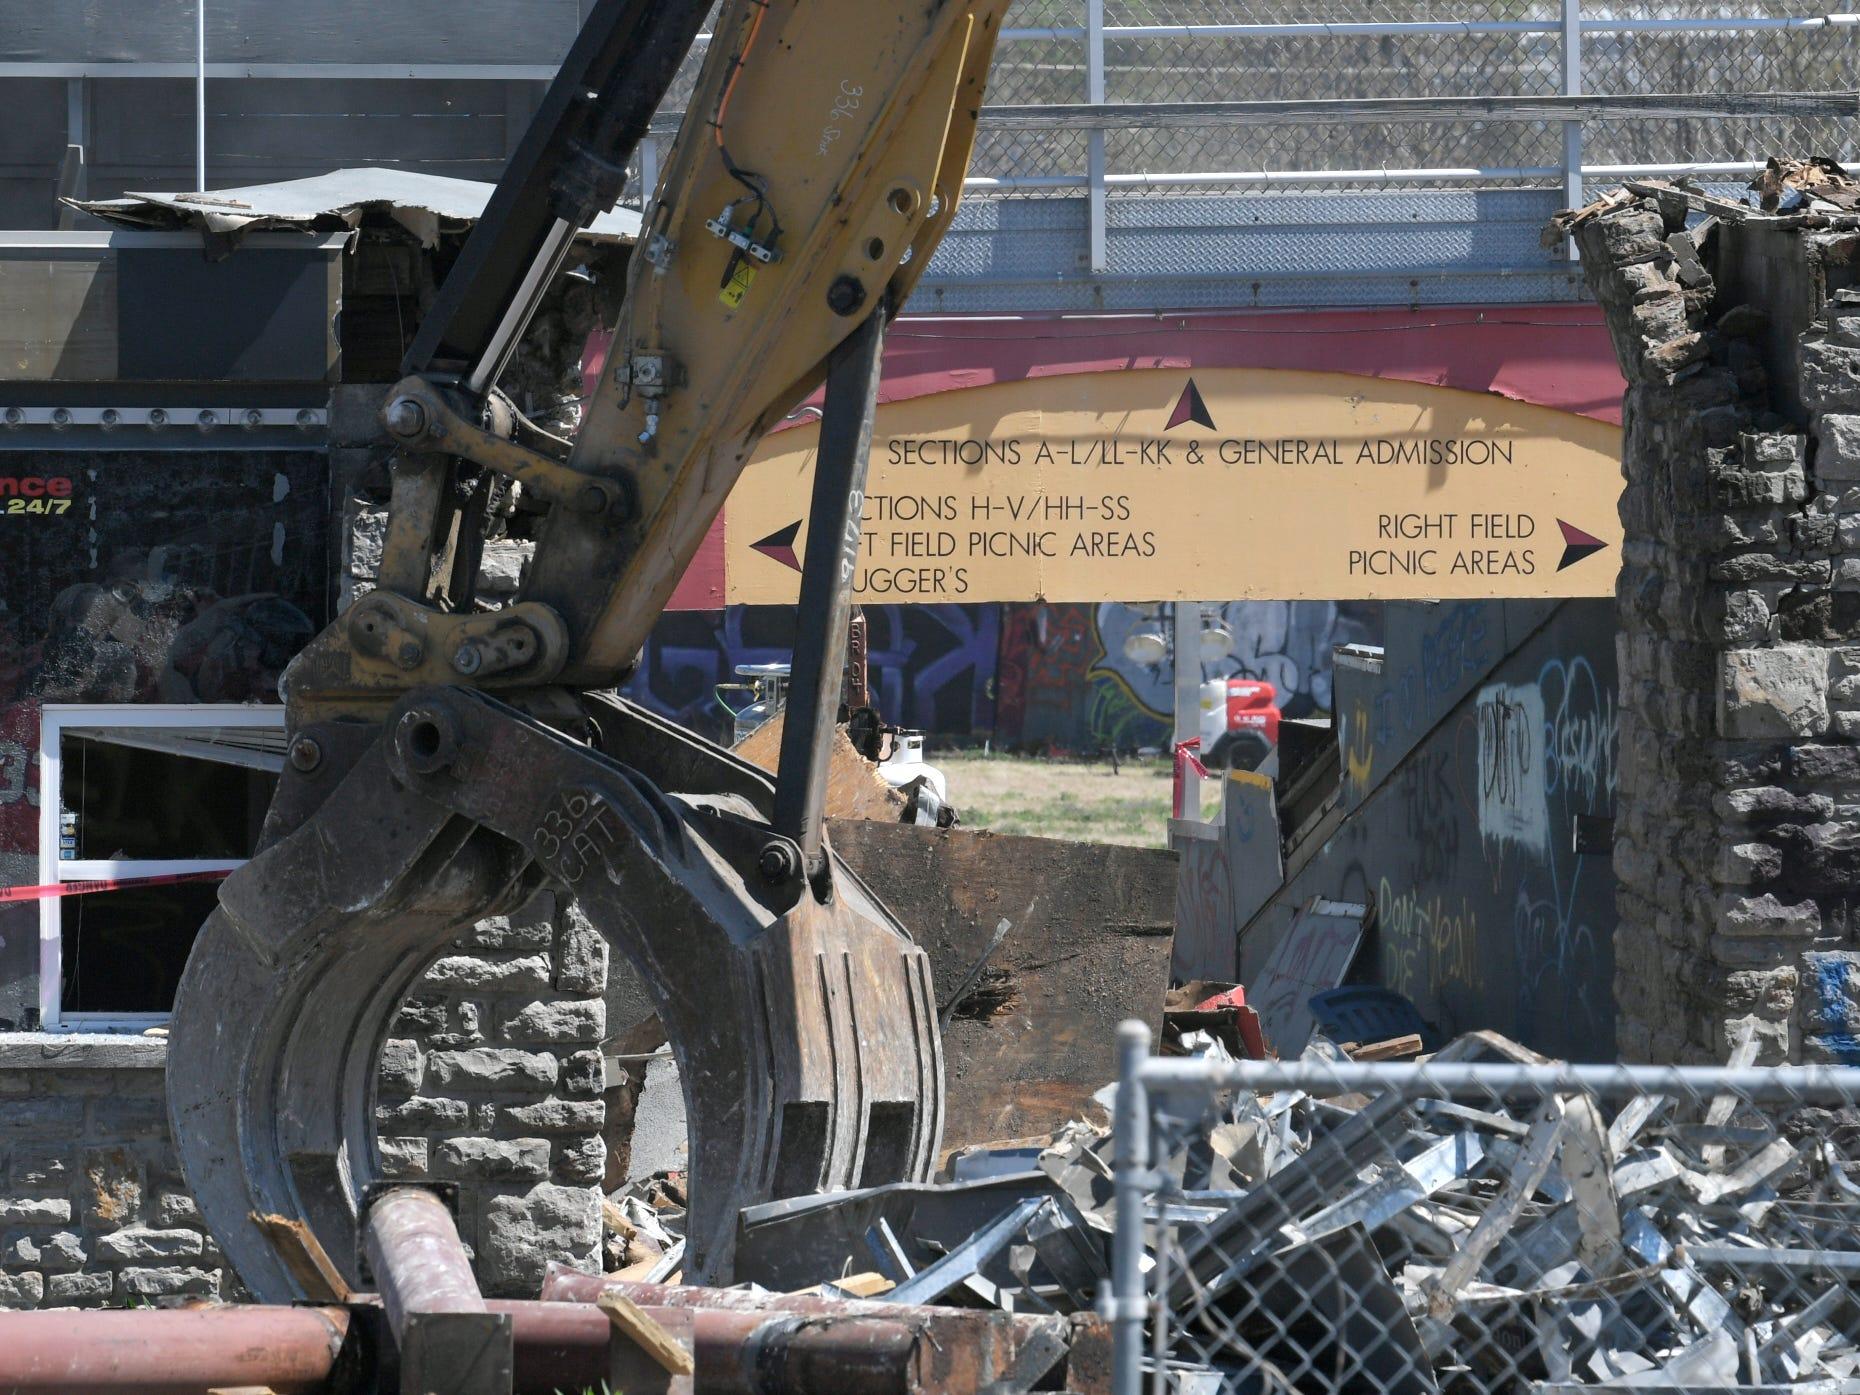 Demolition of Greer Stadium has started. Crews begin tearing down the 41-year-old building.